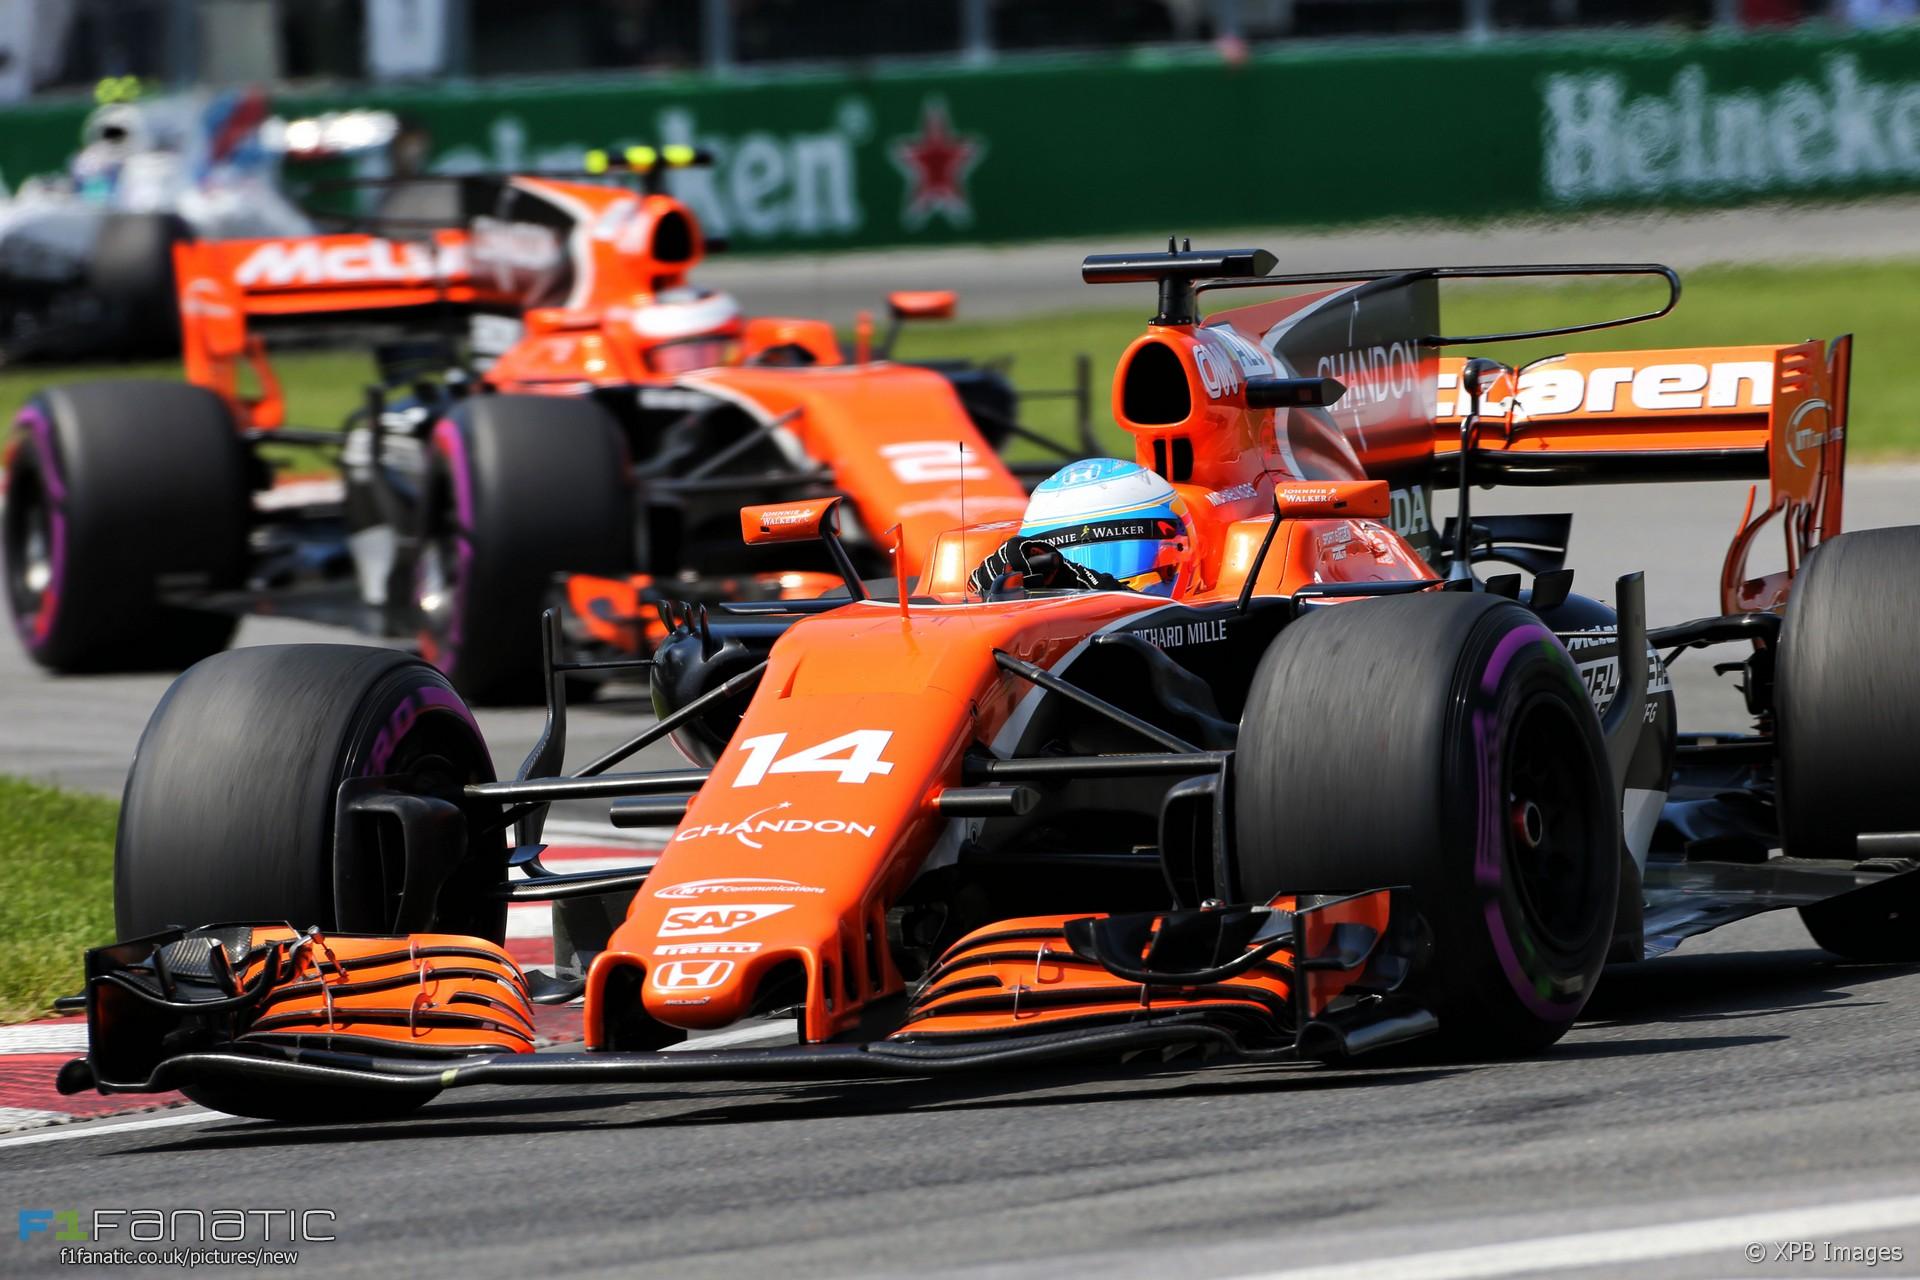 Fernando Alonso Mclaren Circuit Gilles Villeneuve 2017